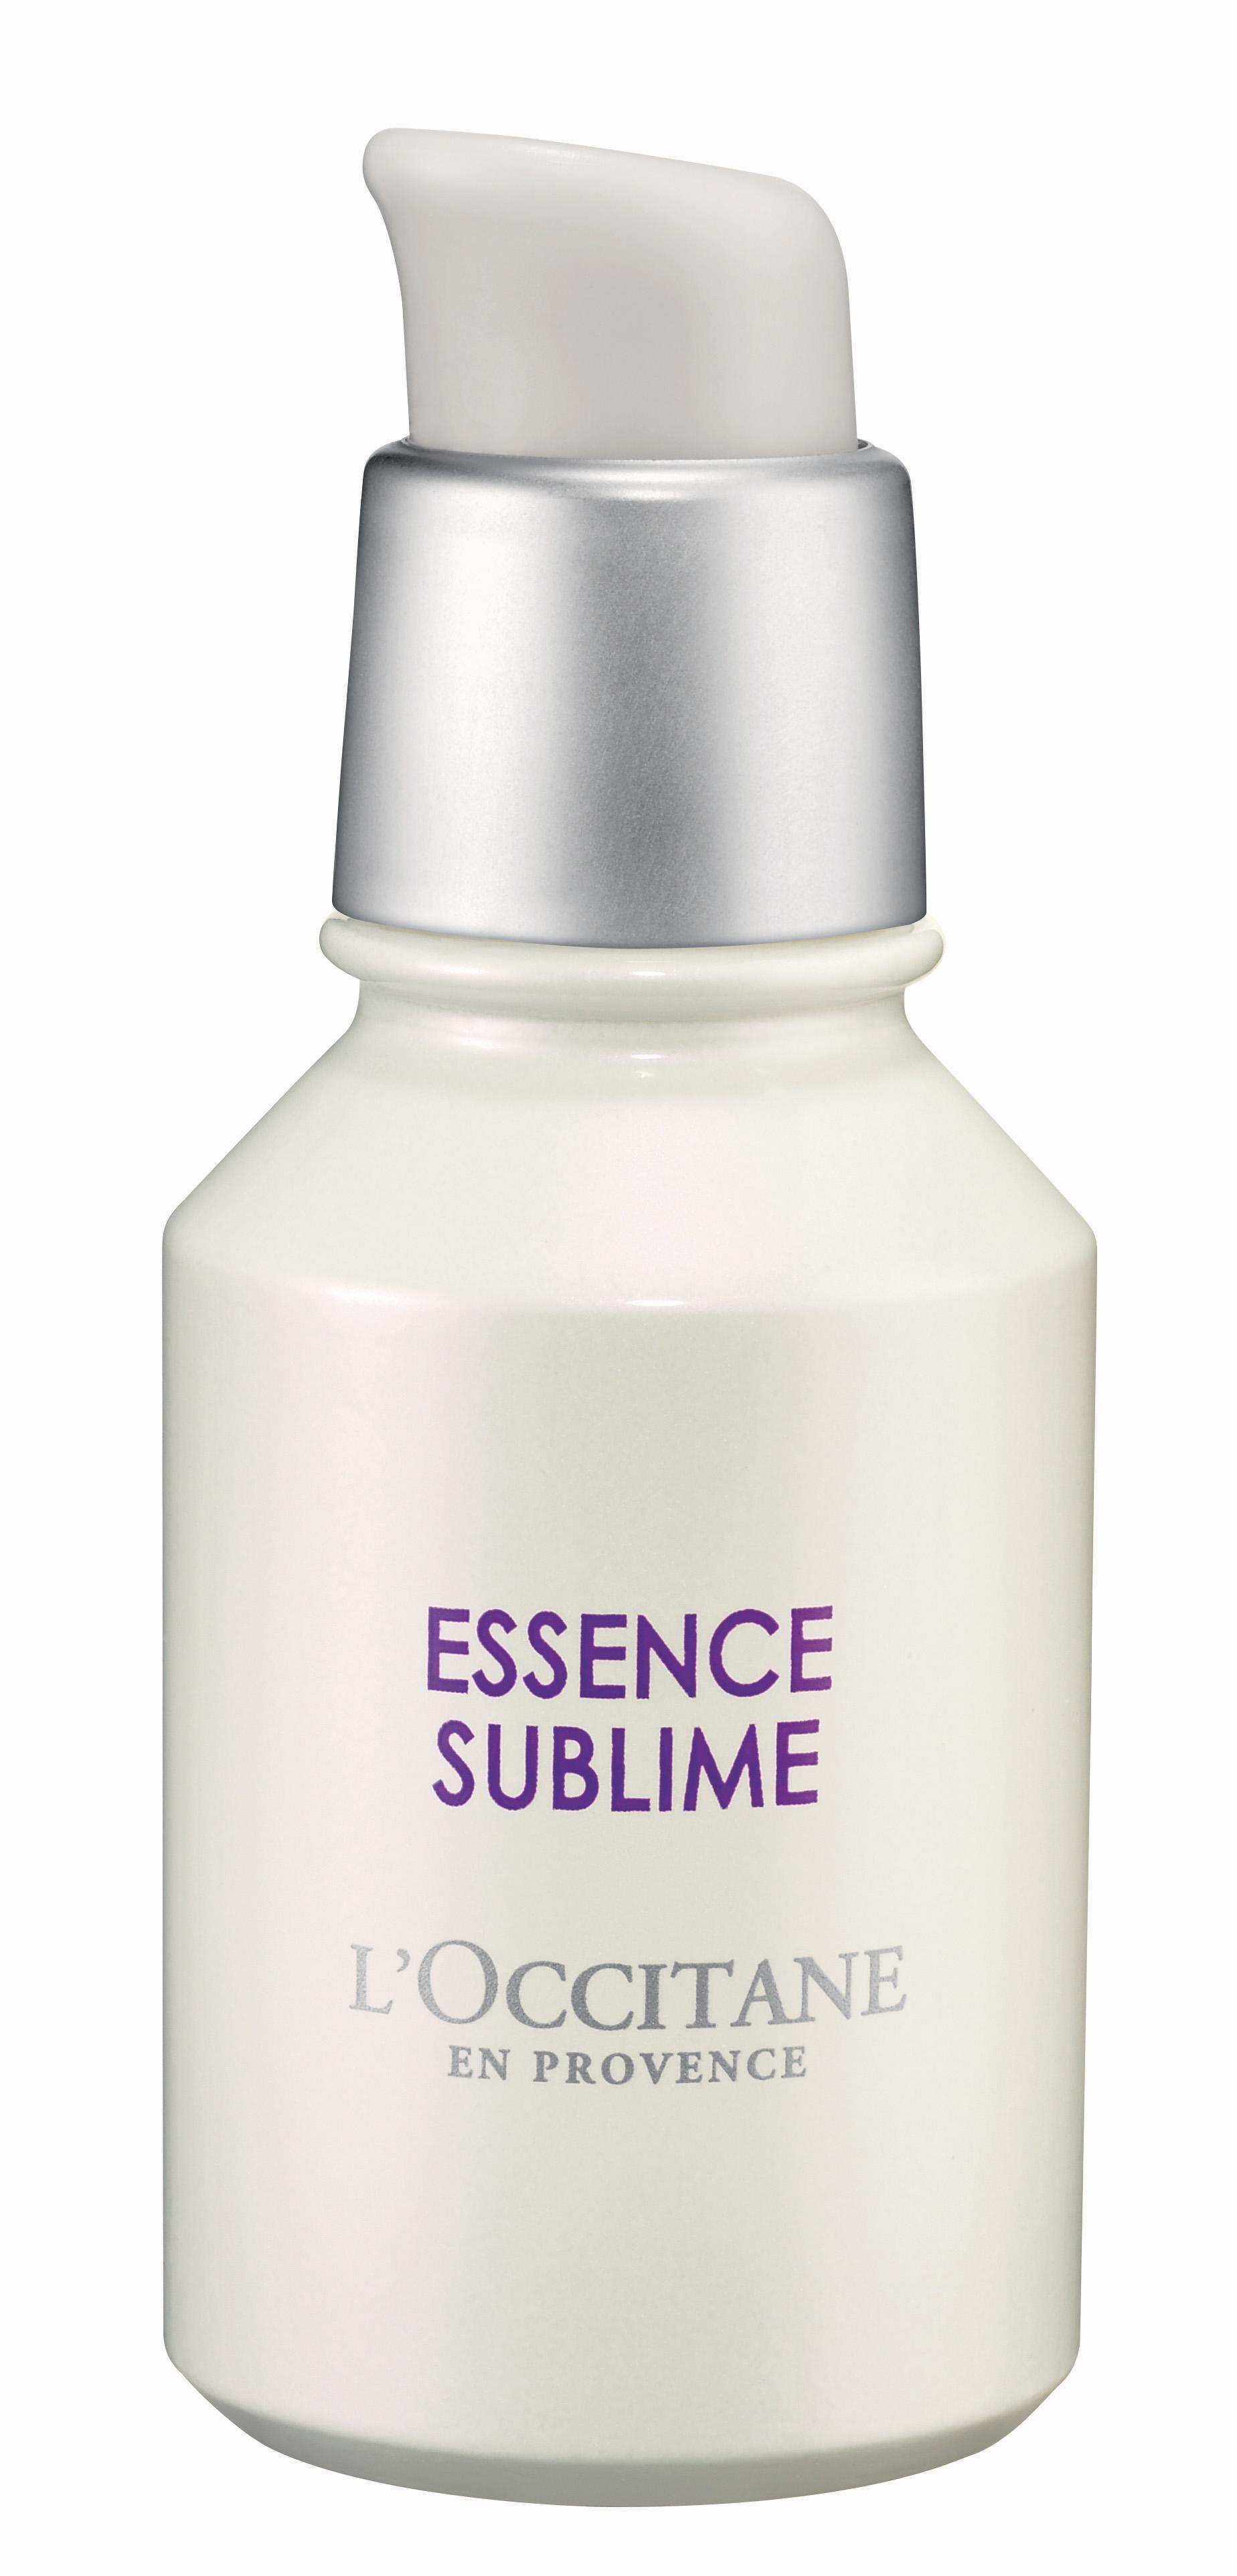 Essence Sublime van L'Occitane - 45 euro